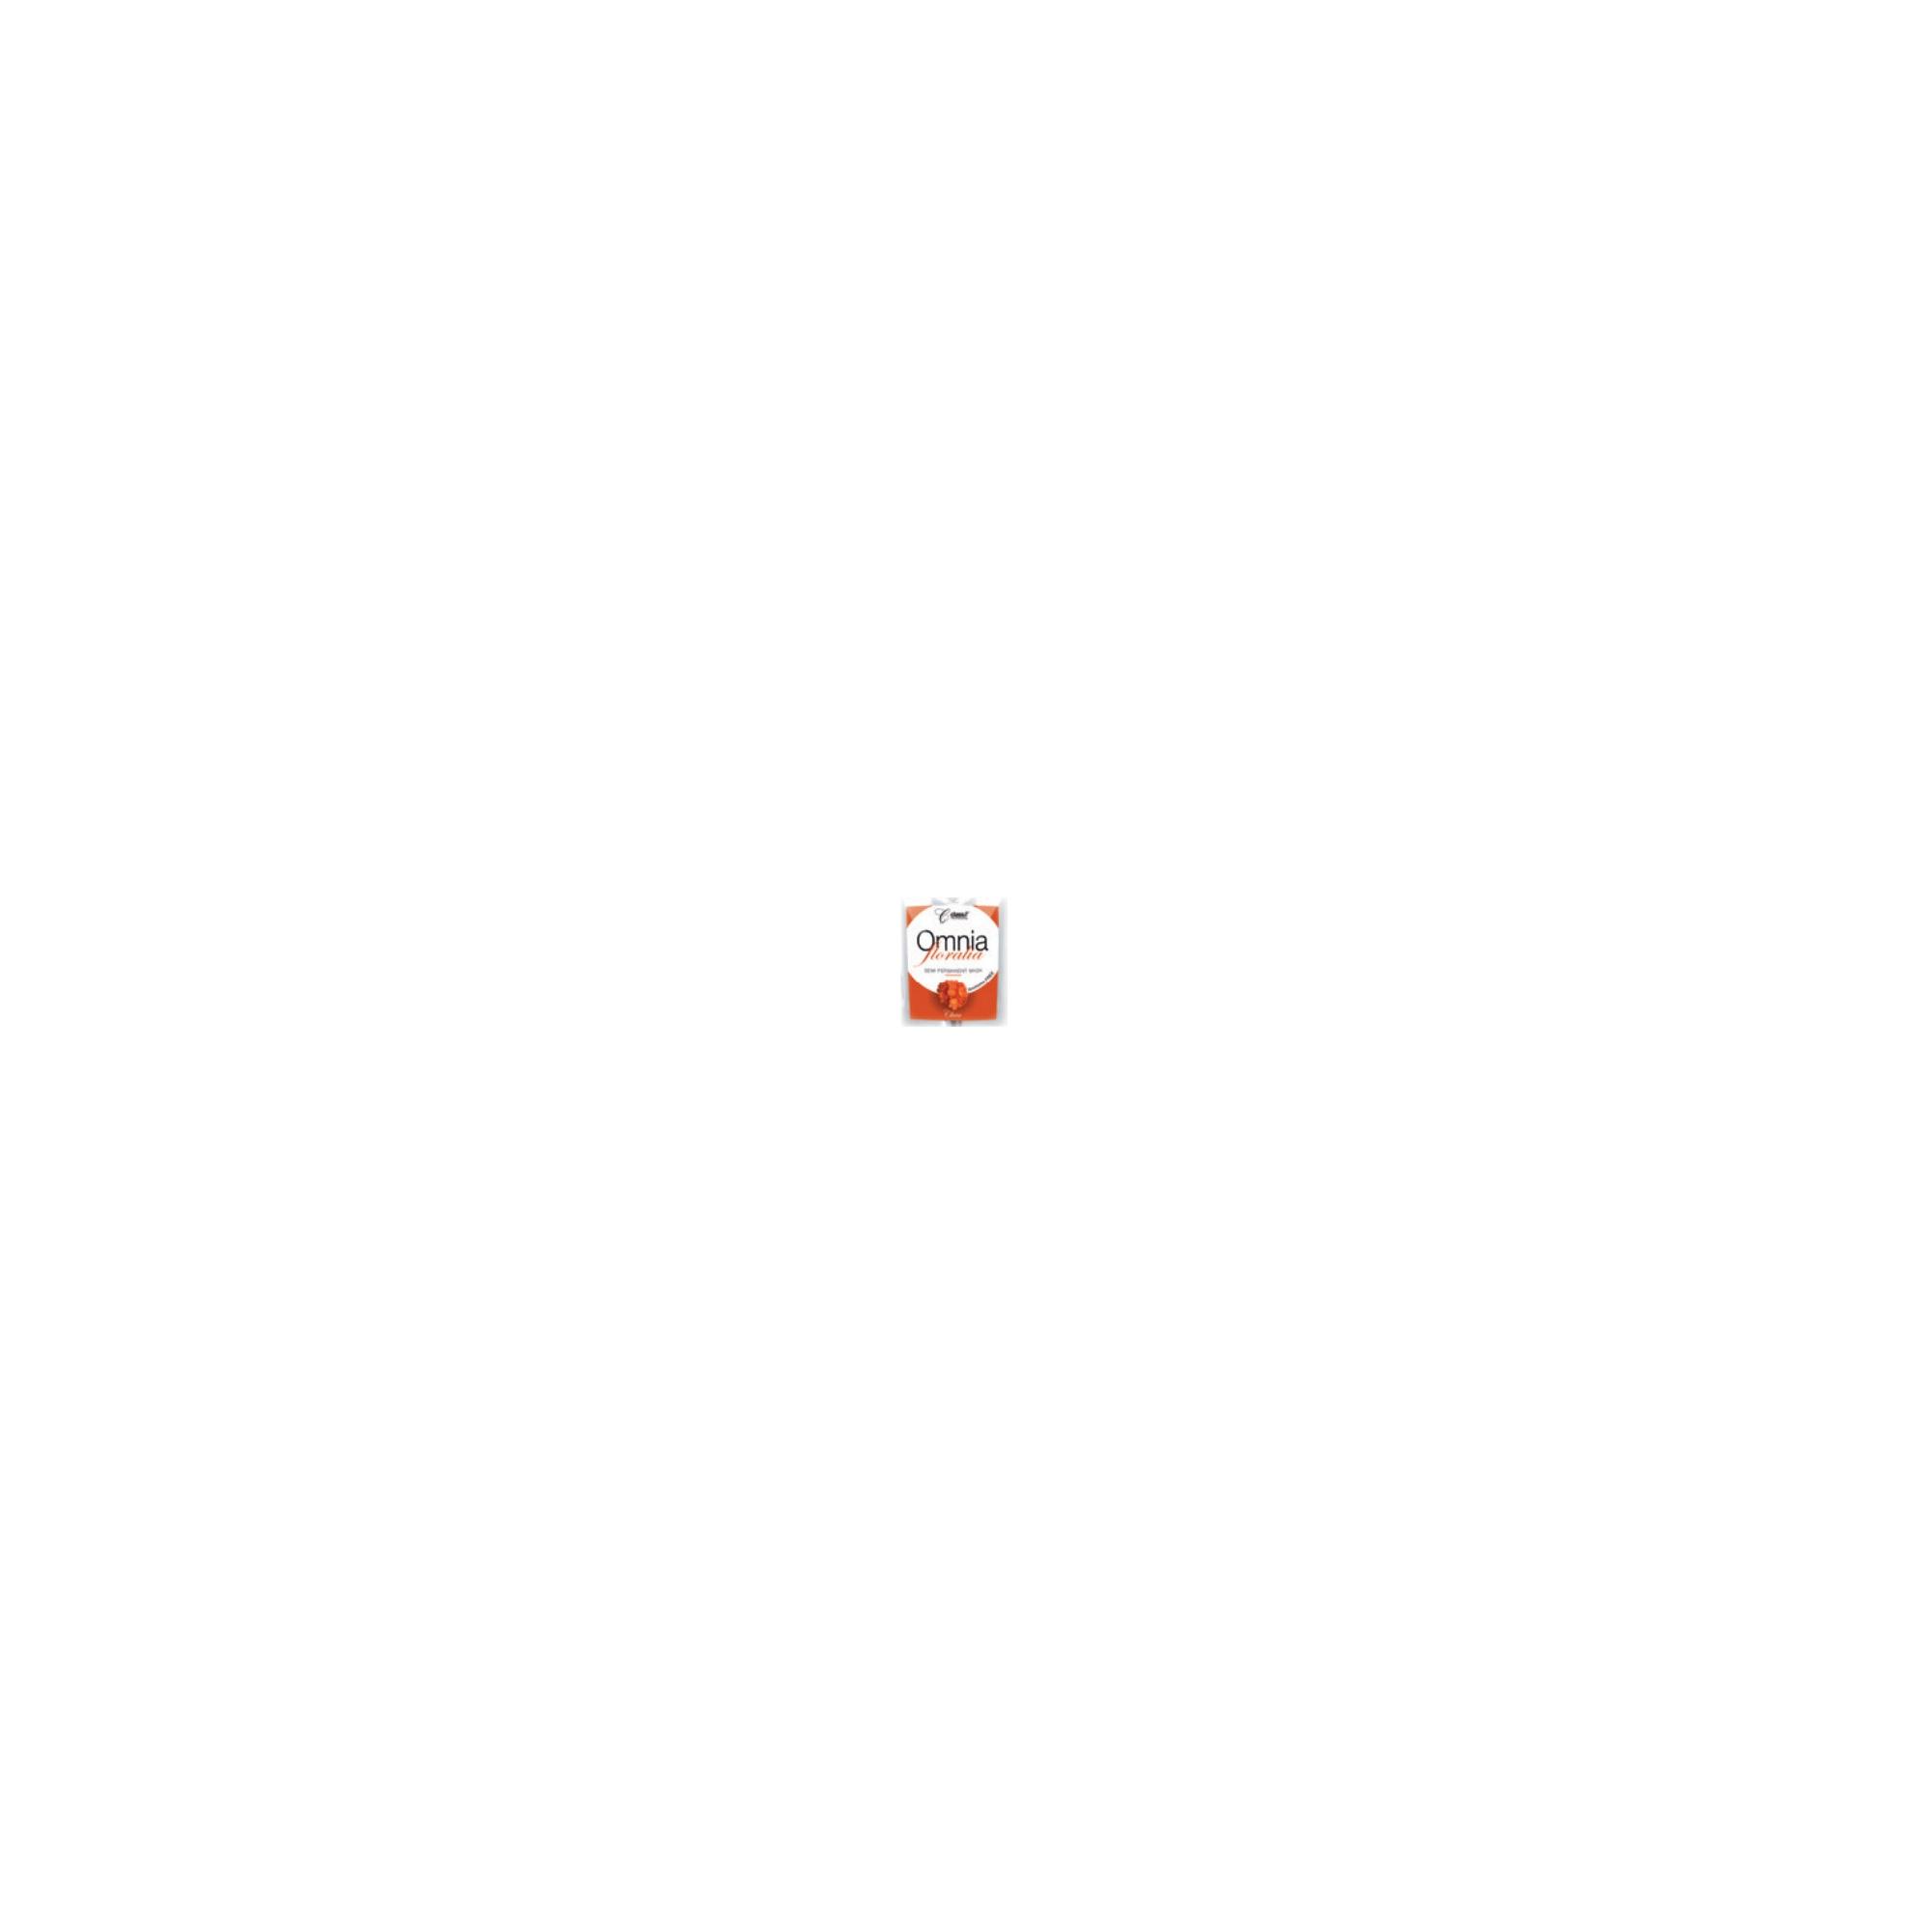 Omnia floralia - Maschera semipermanente Clivia